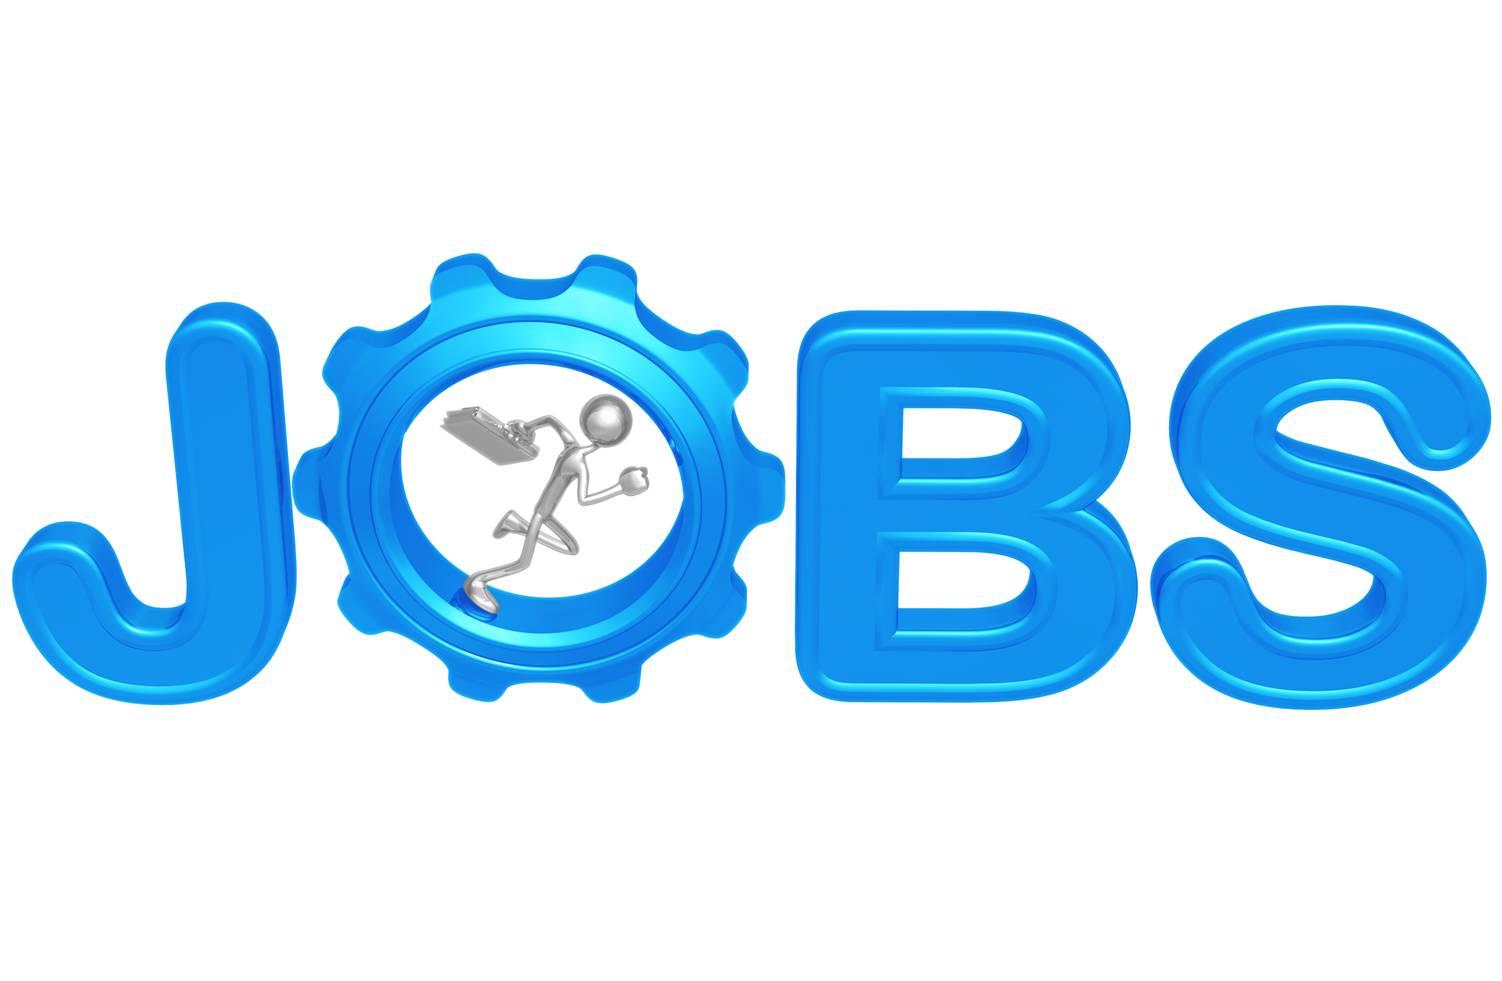 jobs clip